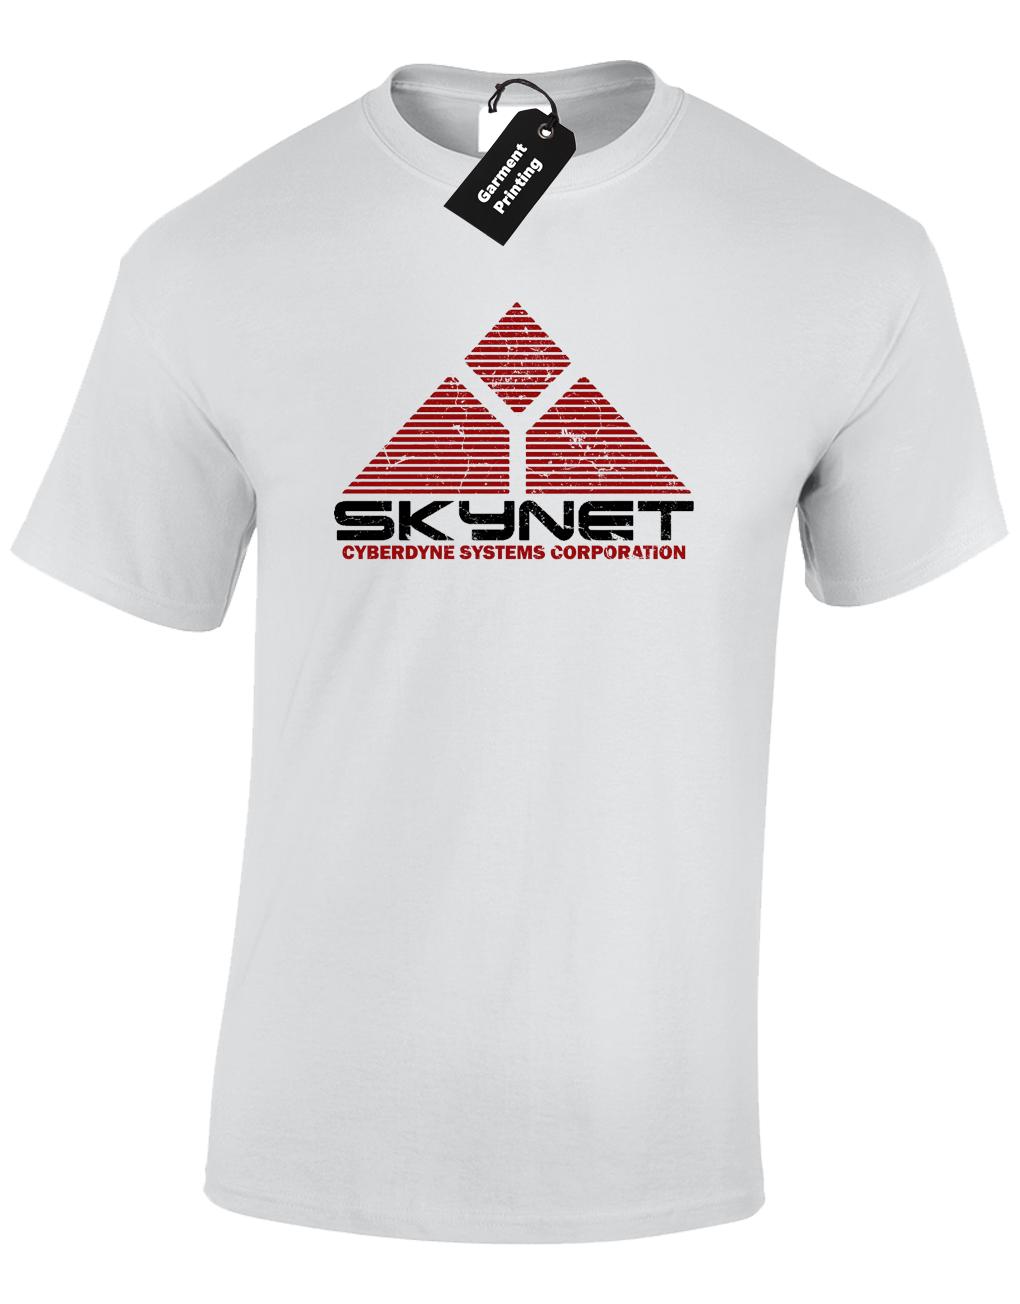 x12 Colours Cyberdyne Skynet Hoodie Movie Film Gift Robot Funny Sci-Fi